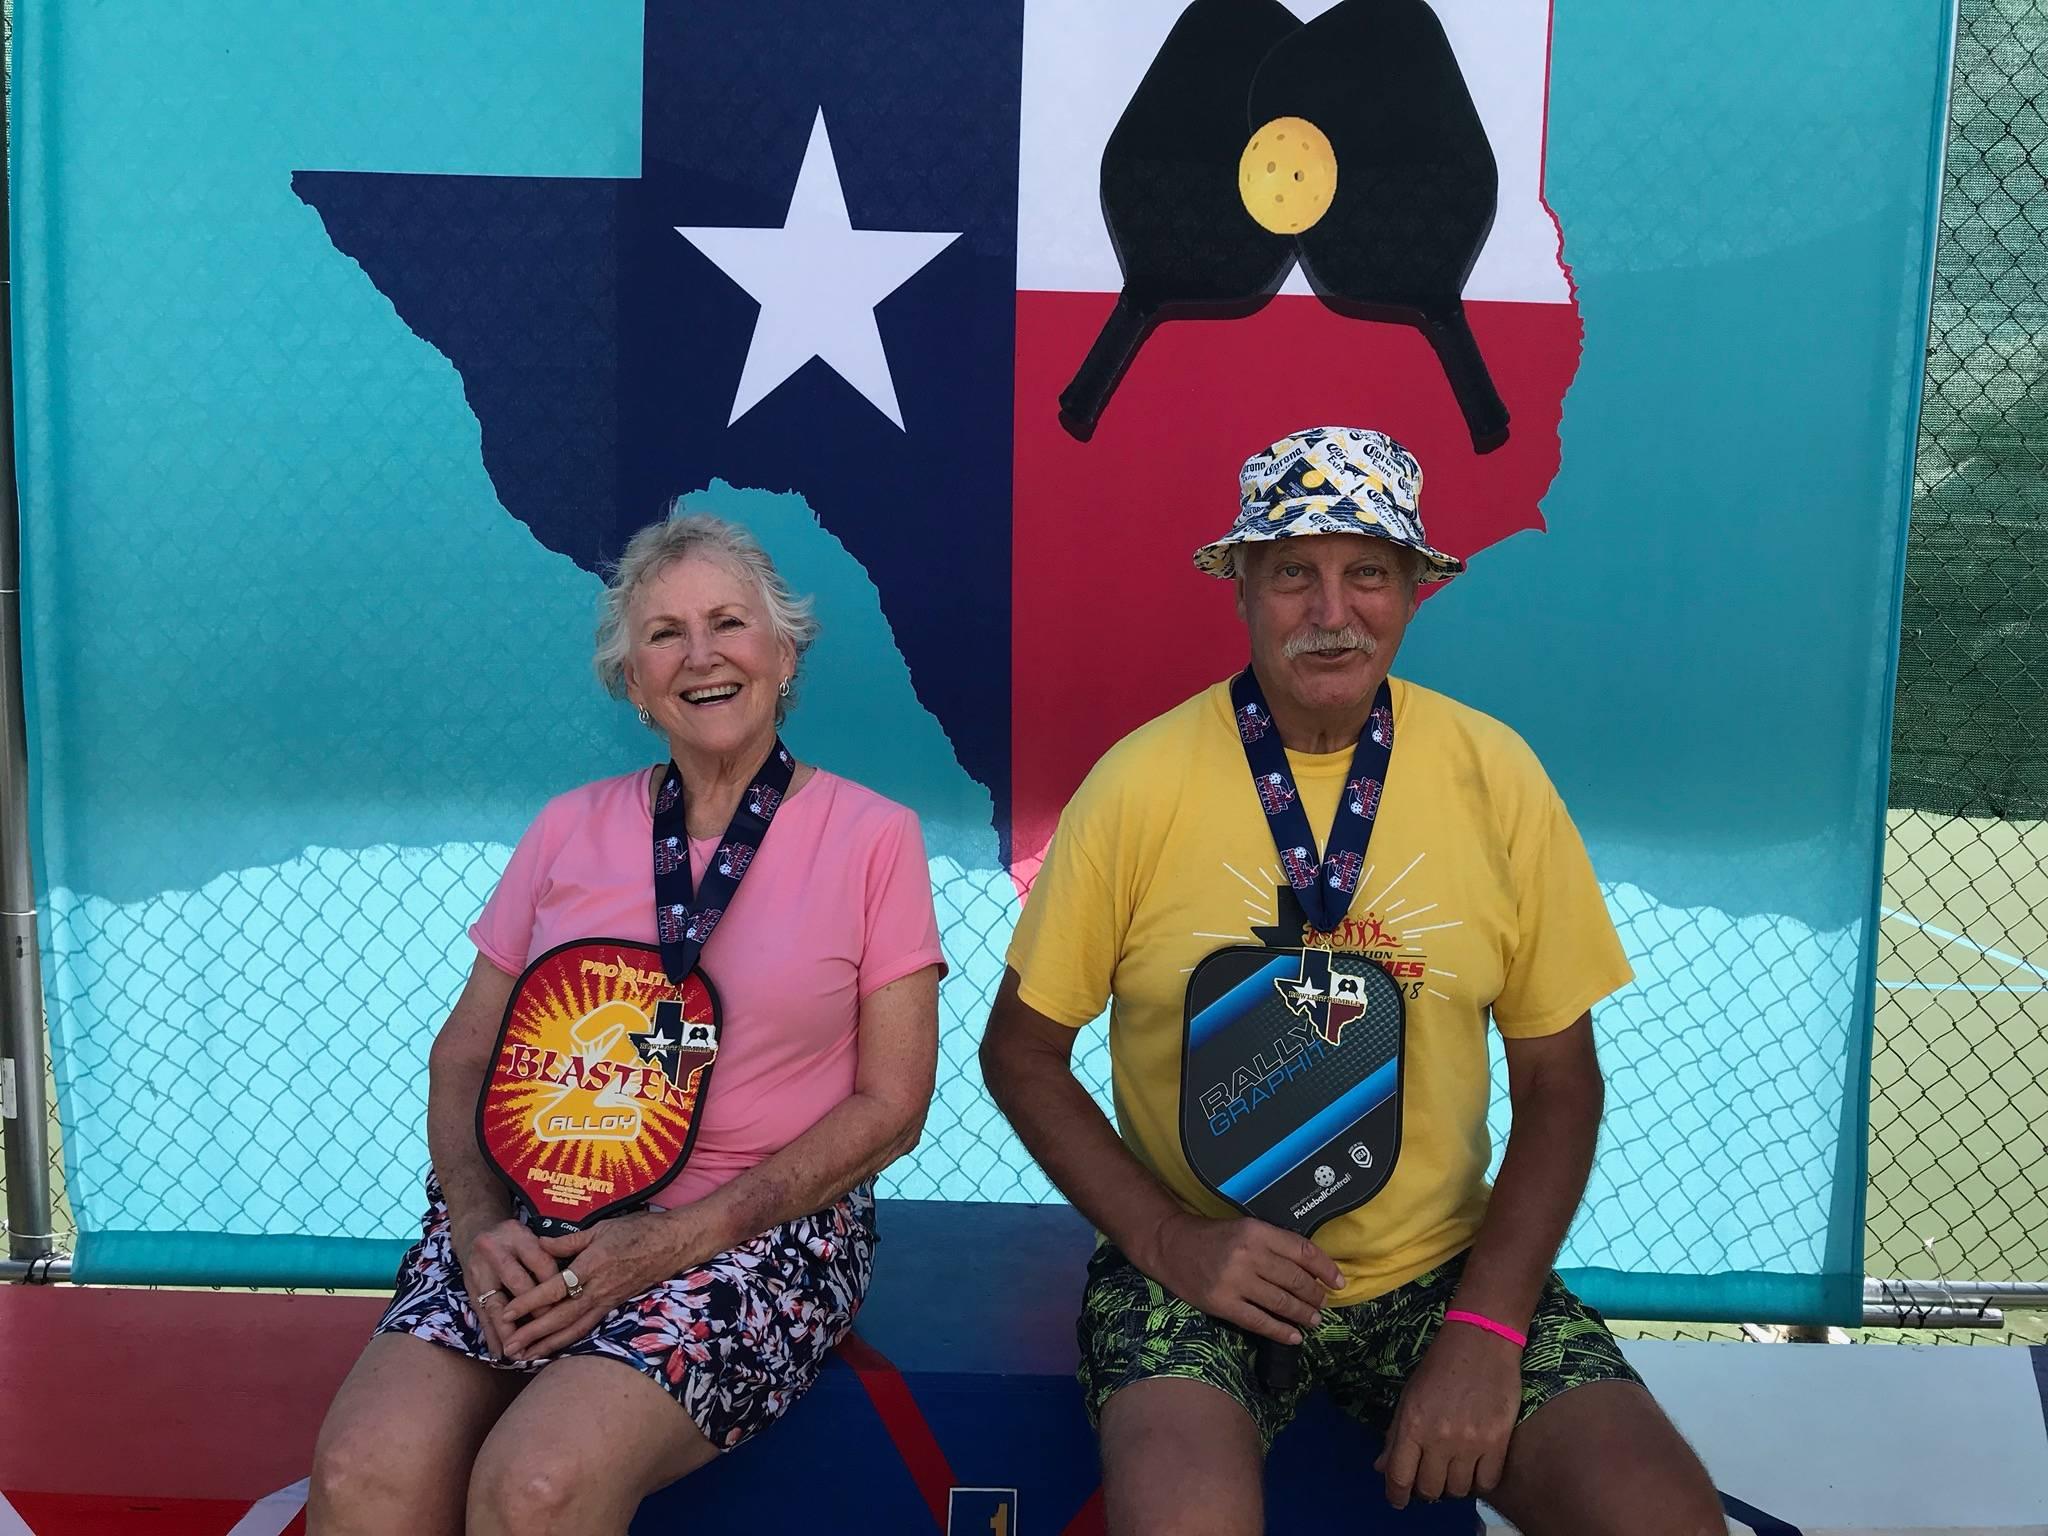 Dennis Reed and Sandra Mathieu